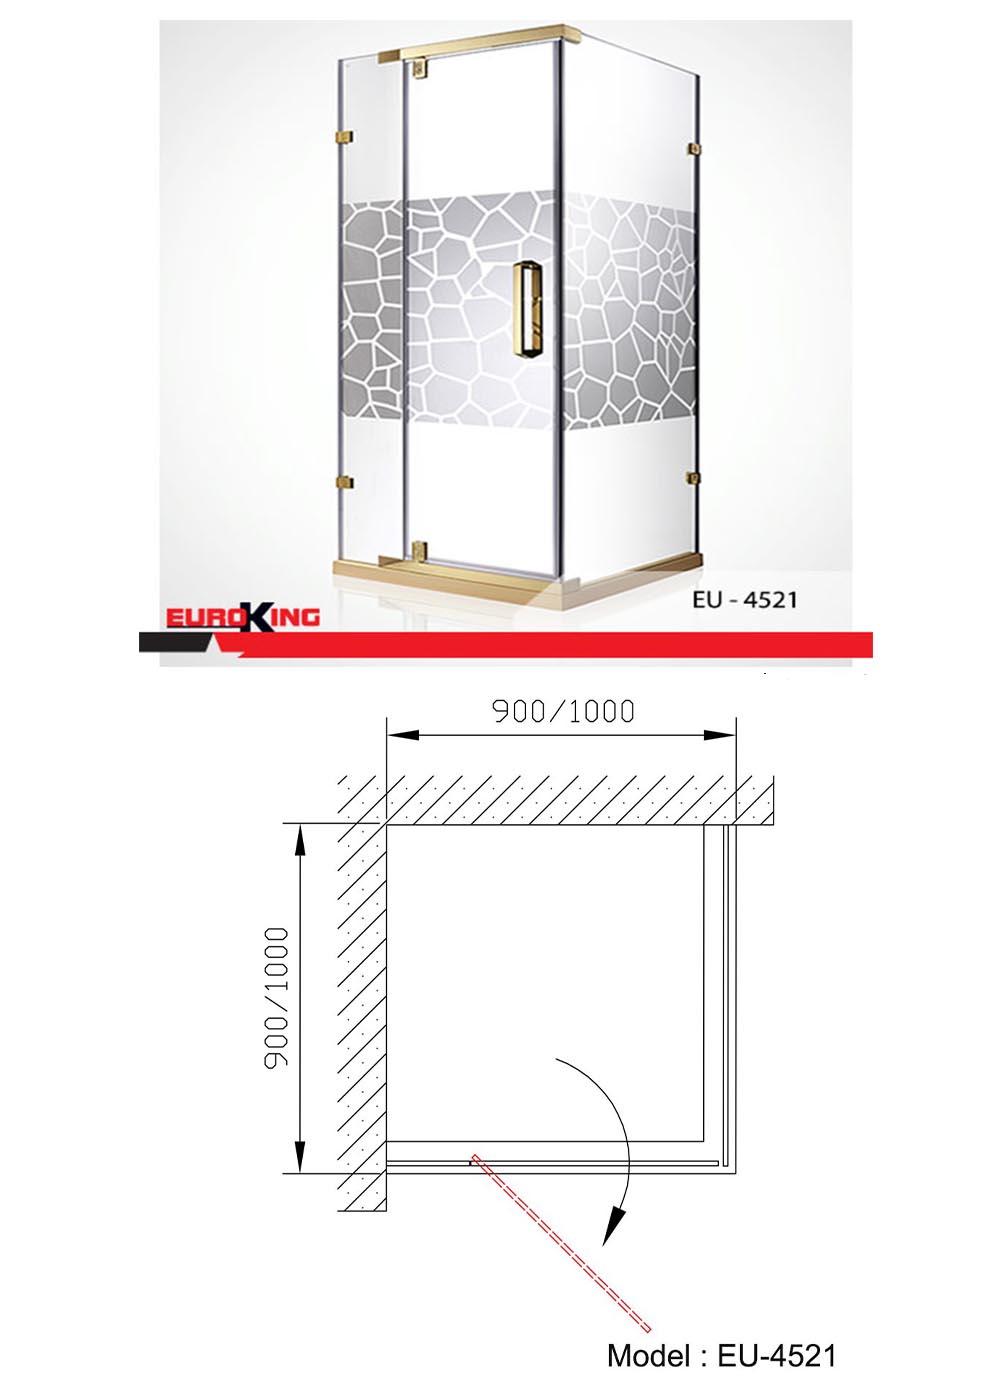 Bảng vẽ kỹ thuật EU-4521